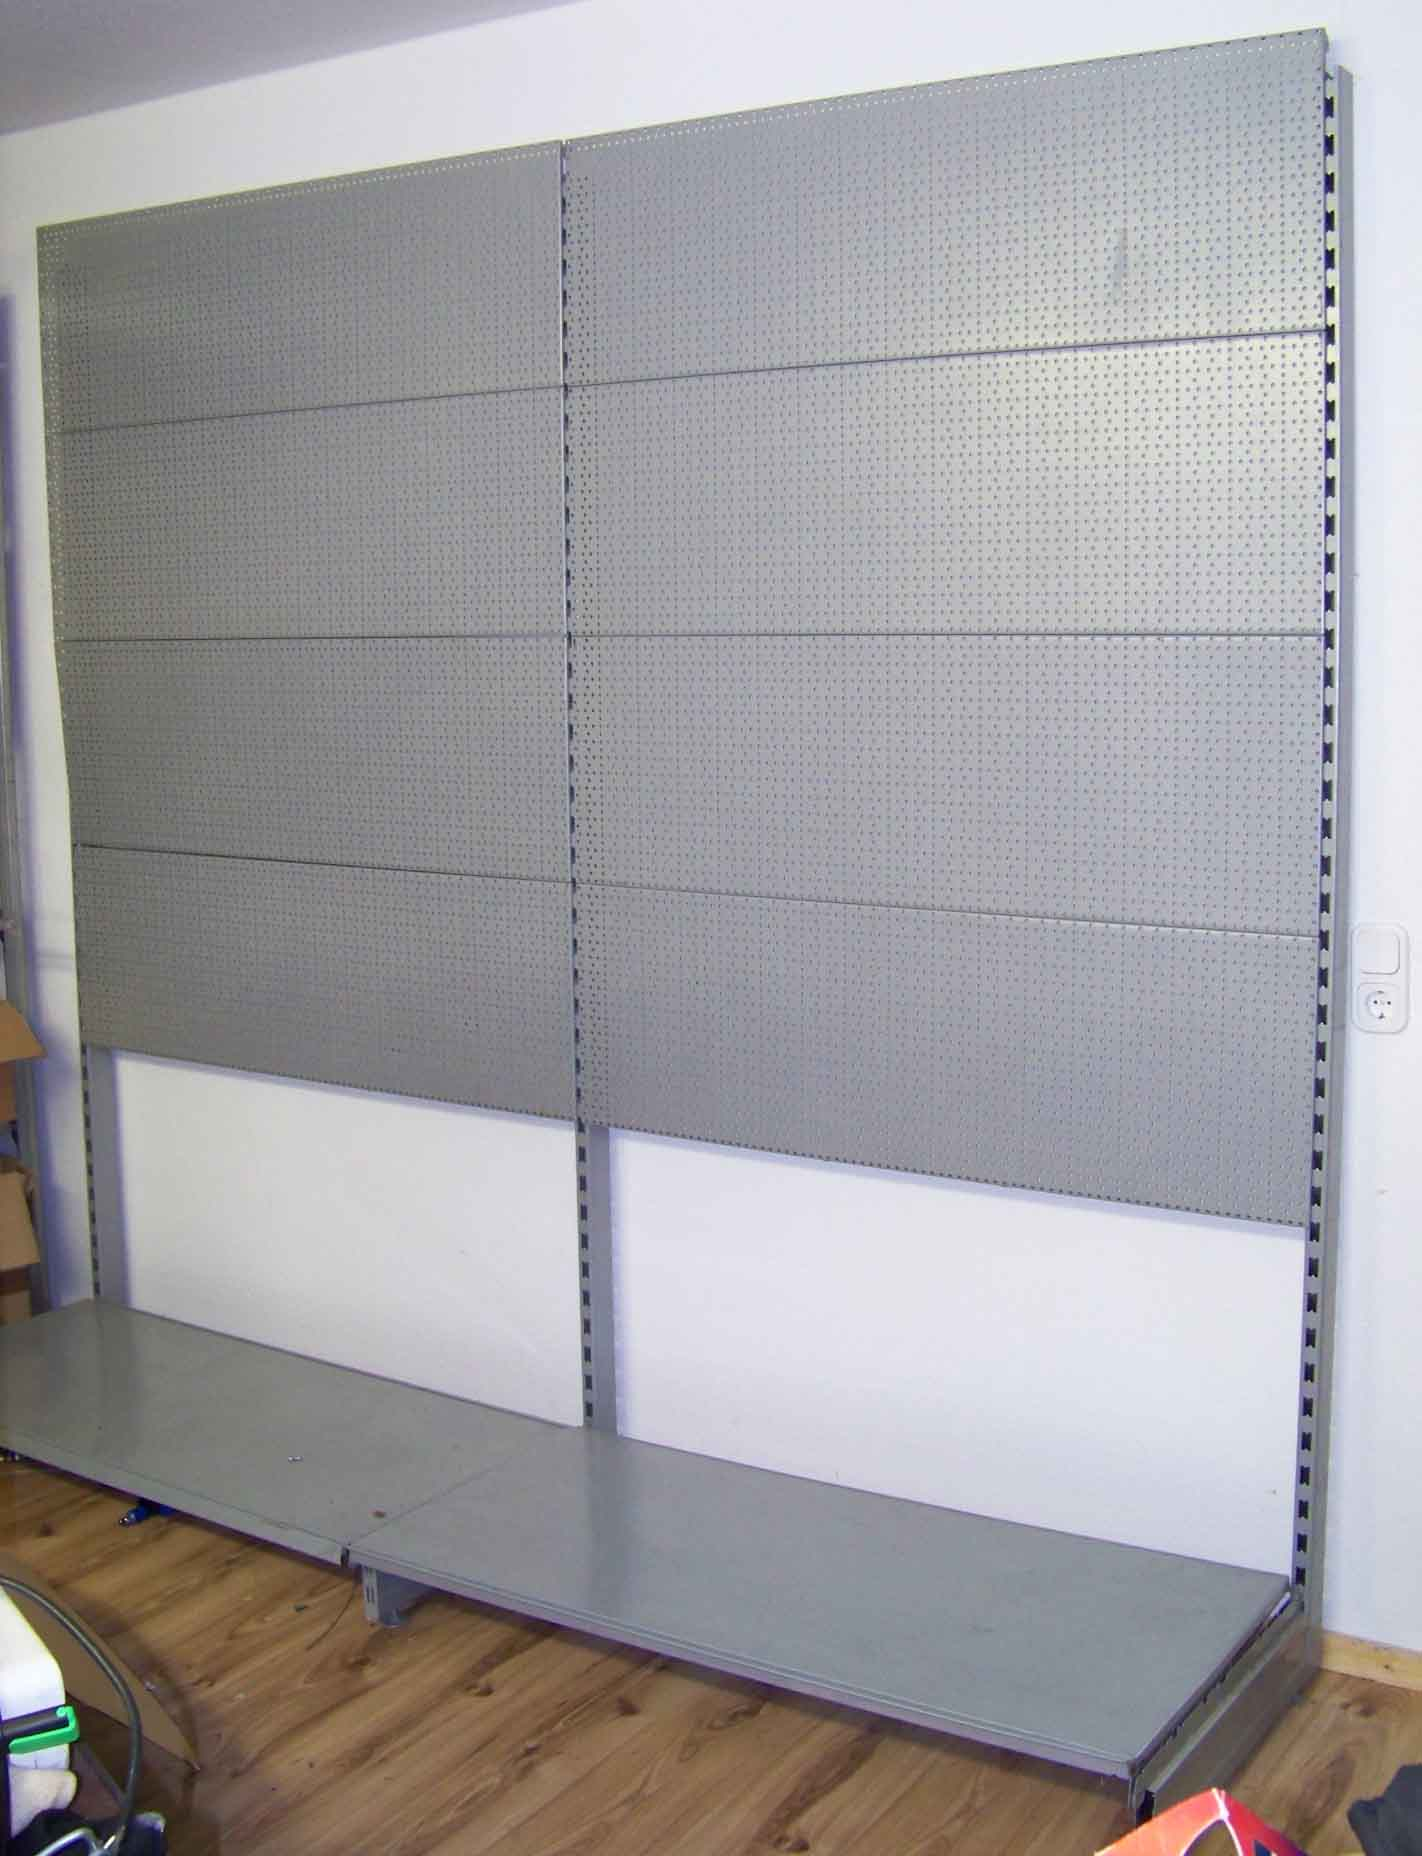 lochwandregal lochwand regal wandregal 220 x 252 cm ladenregal metalregal ebay. Black Bedroom Furniture Sets. Home Design Ideas